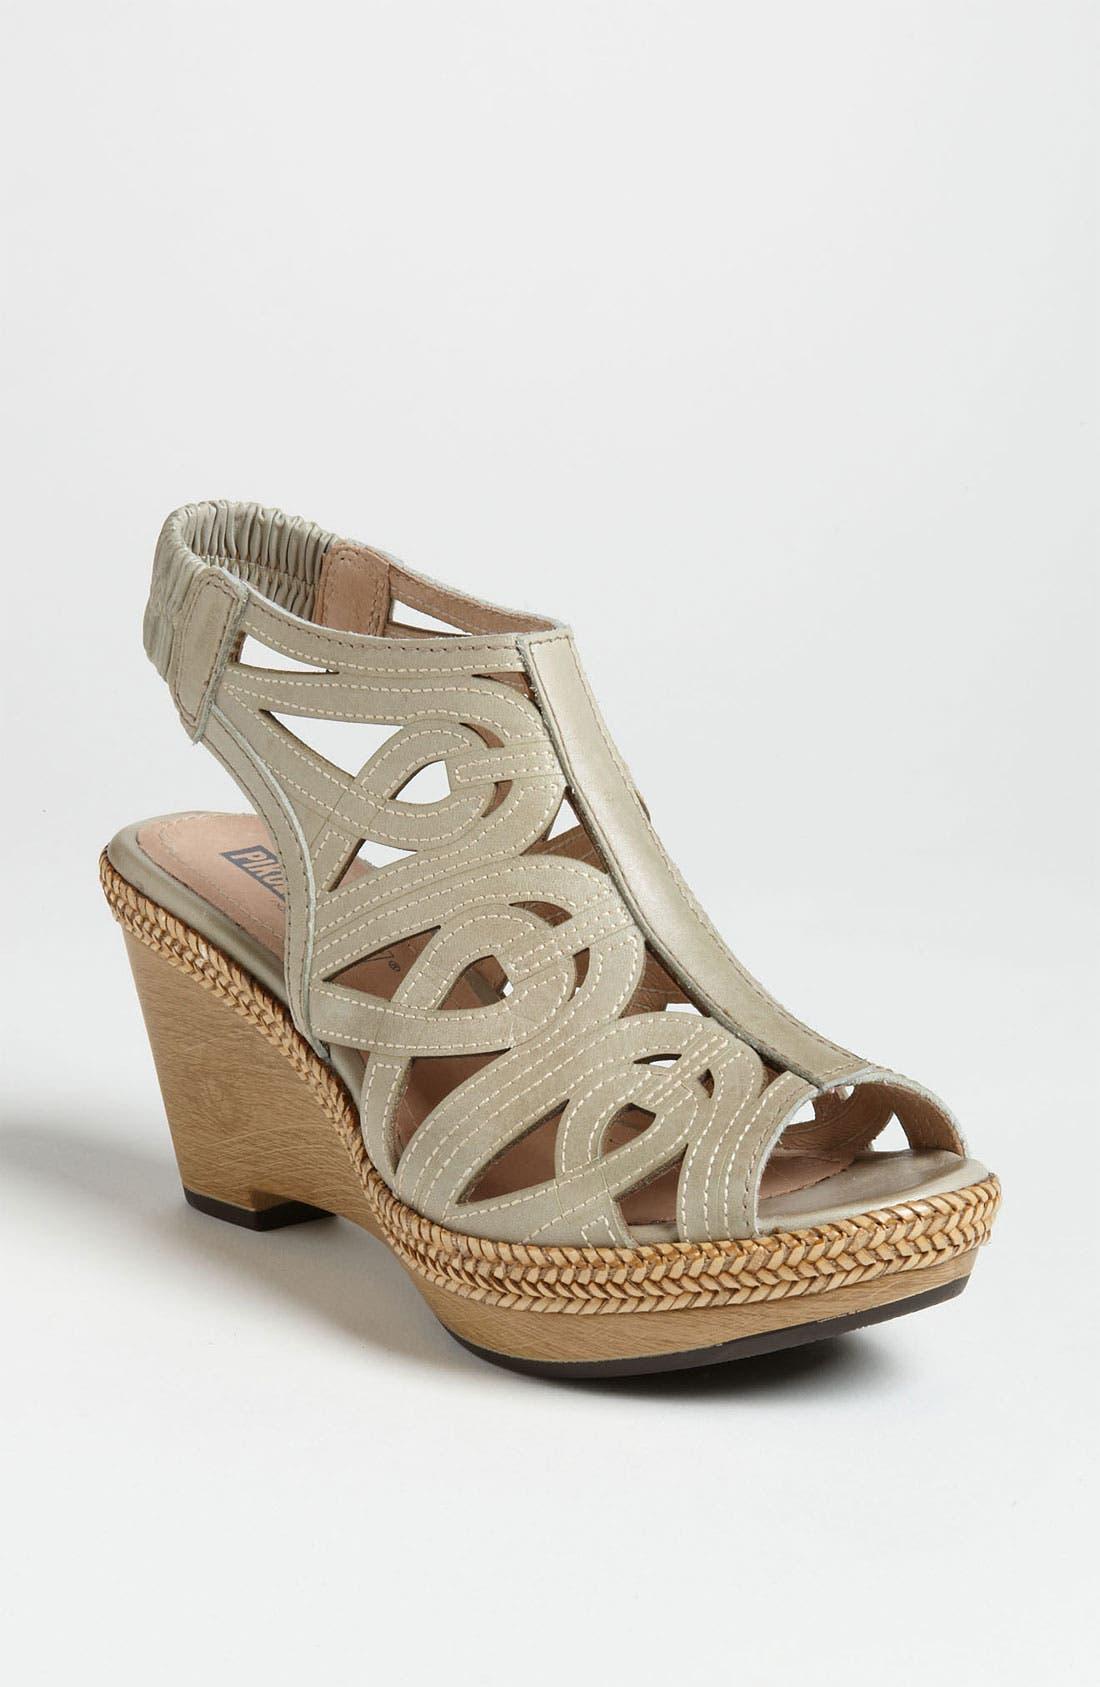 Alternate Image 1 Selected - PIKOLINOS 'Gomera' Sandal